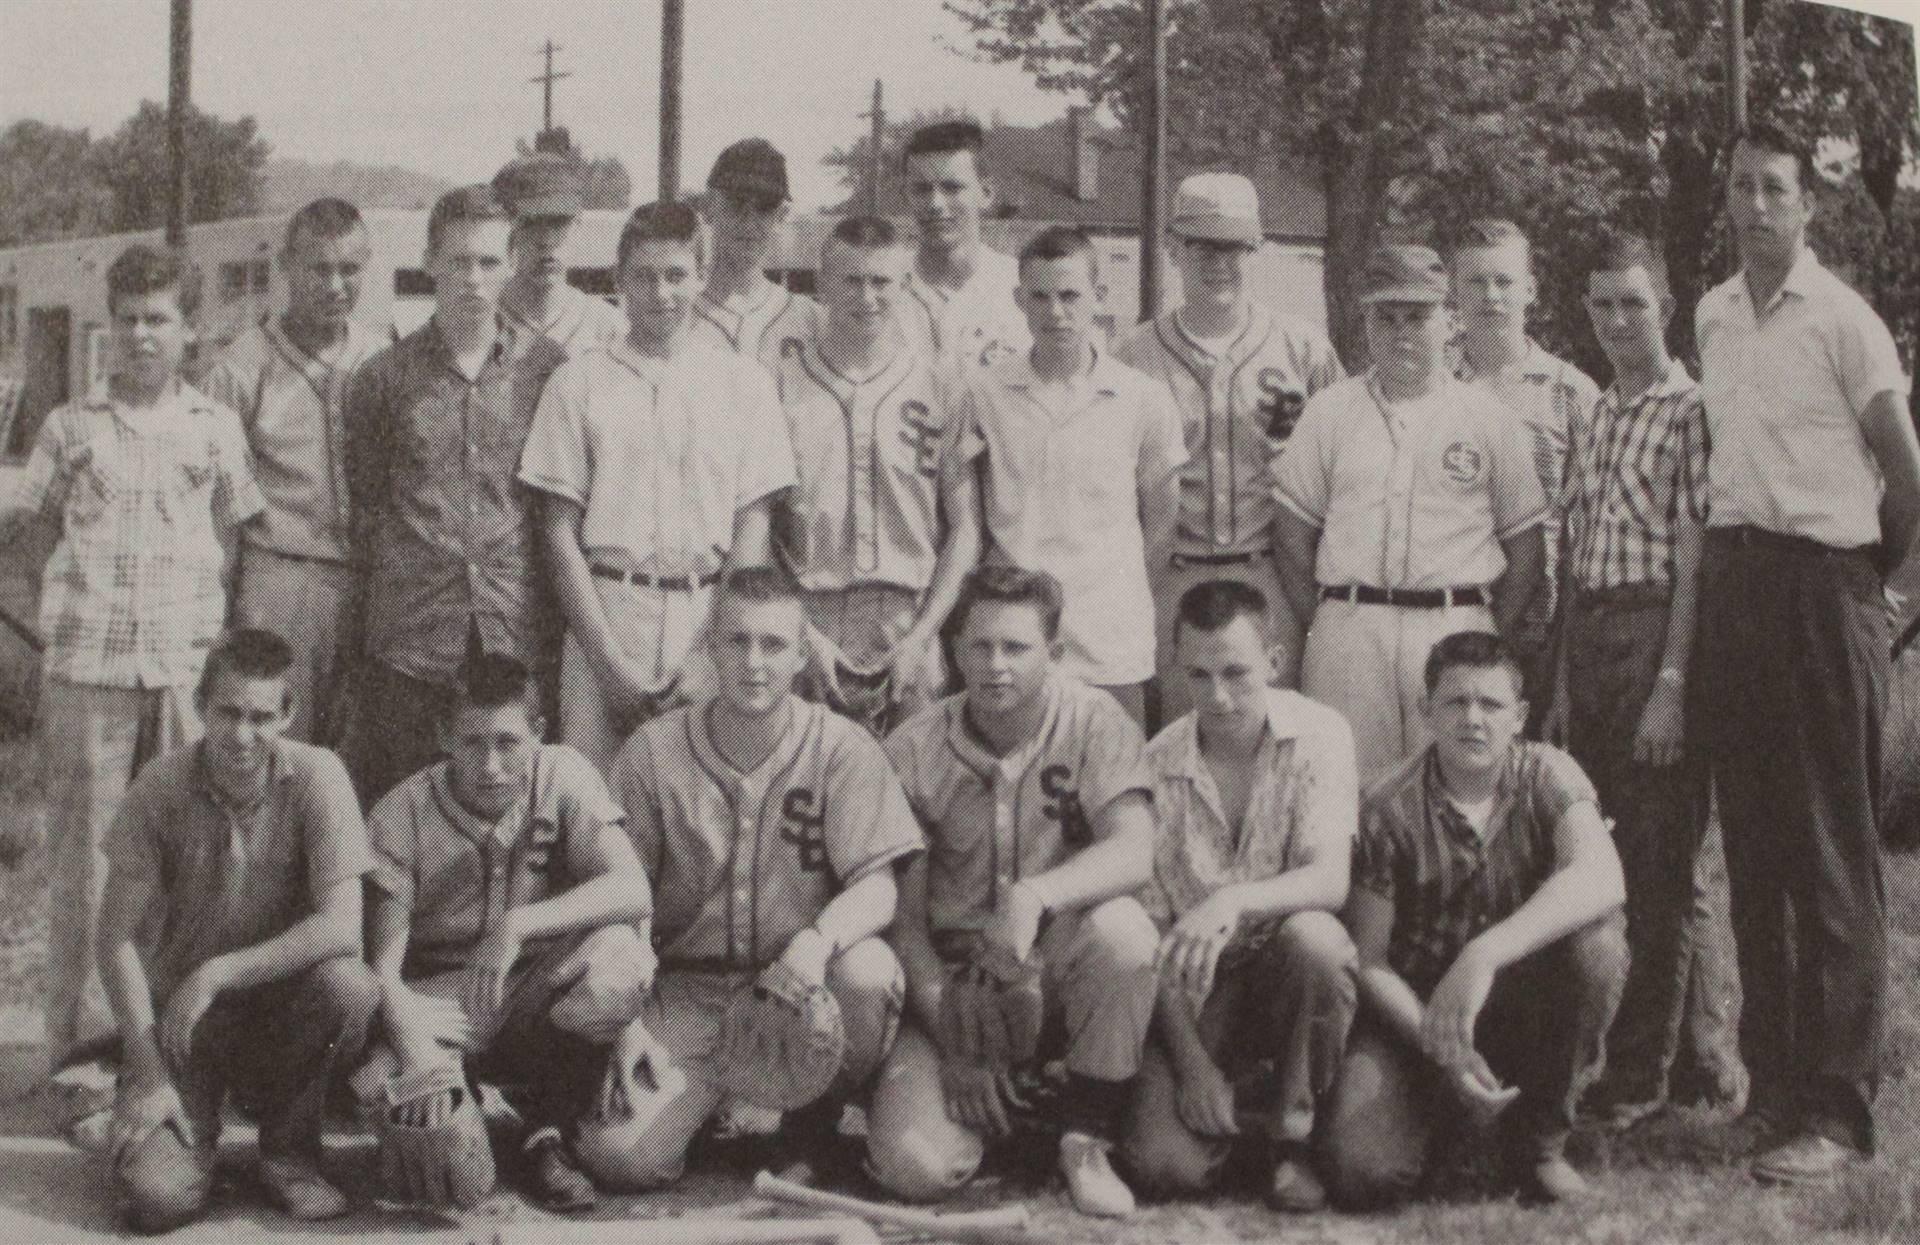 1962 Senior Varsity Baseball Team